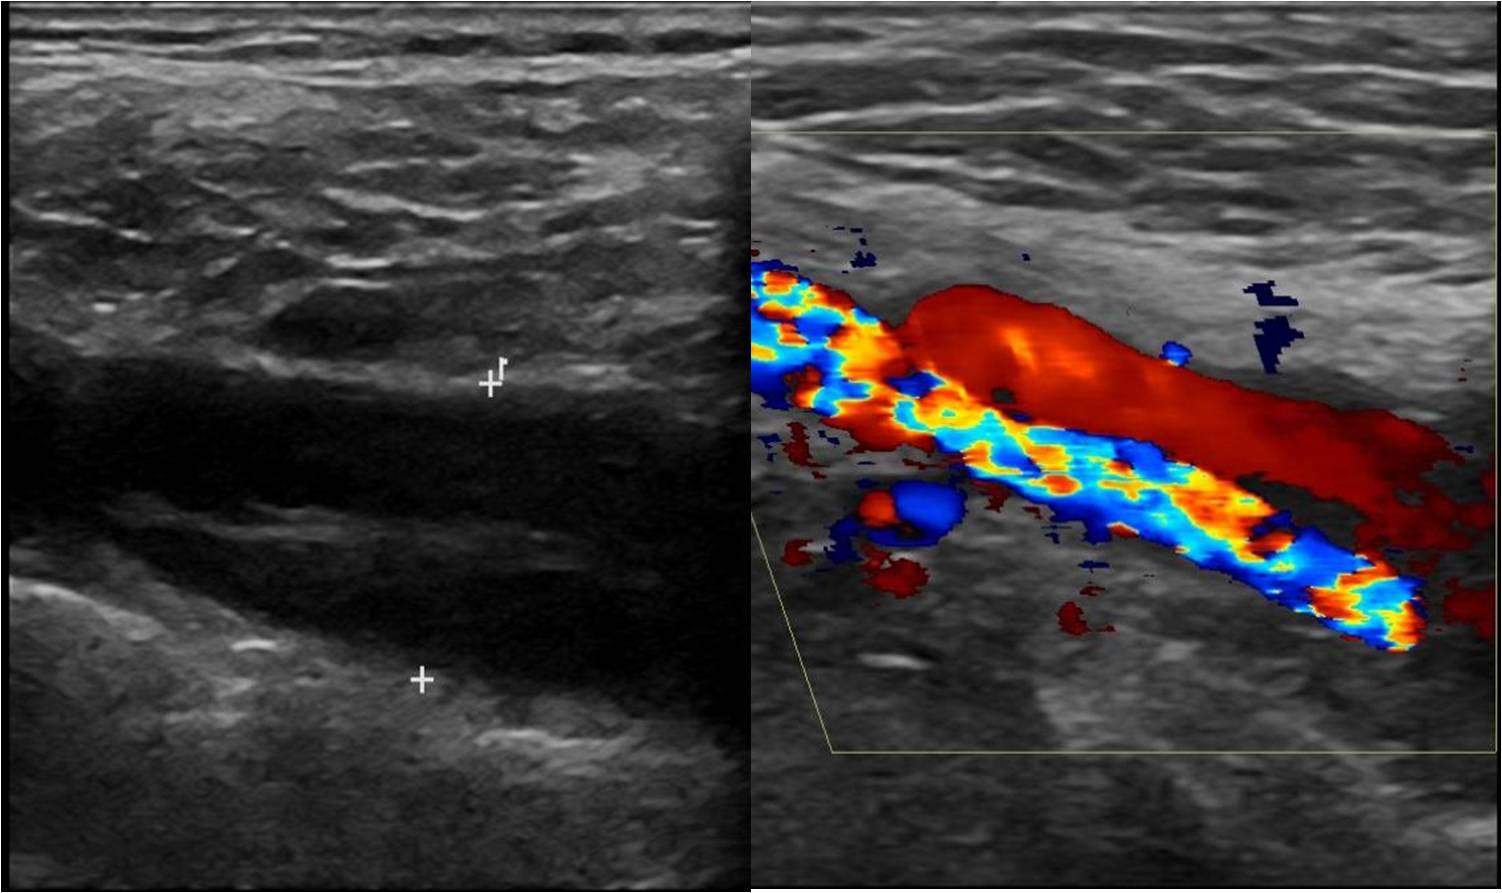 Carotid Artery Carotid Artery Ultrasound Images